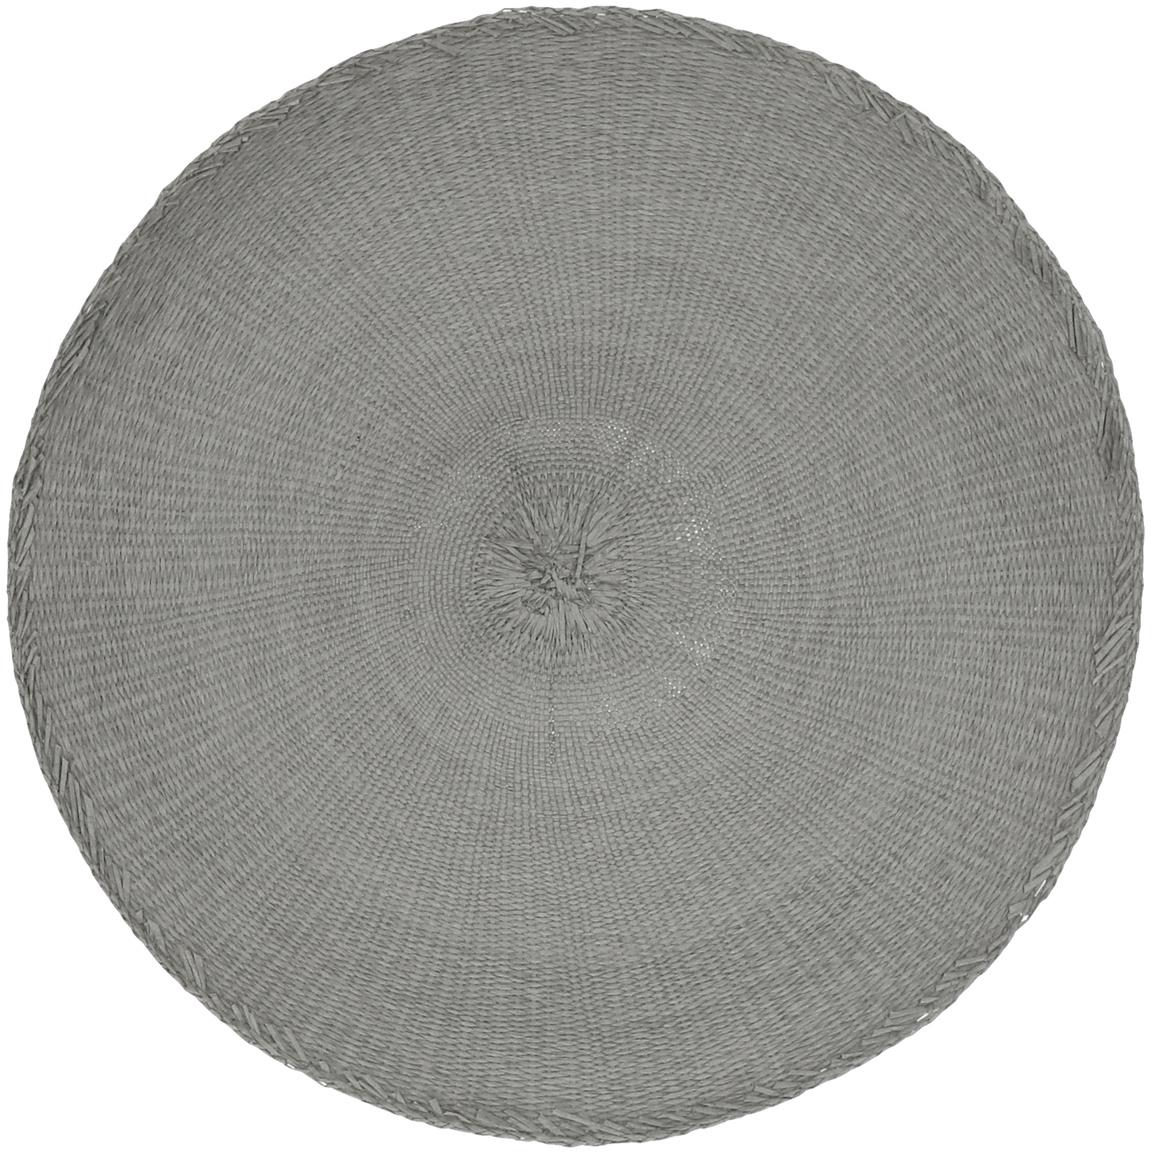 Manteles individuales redondos Kolori, 2uds., Fibras de papel, Gris, Ø 38 cm